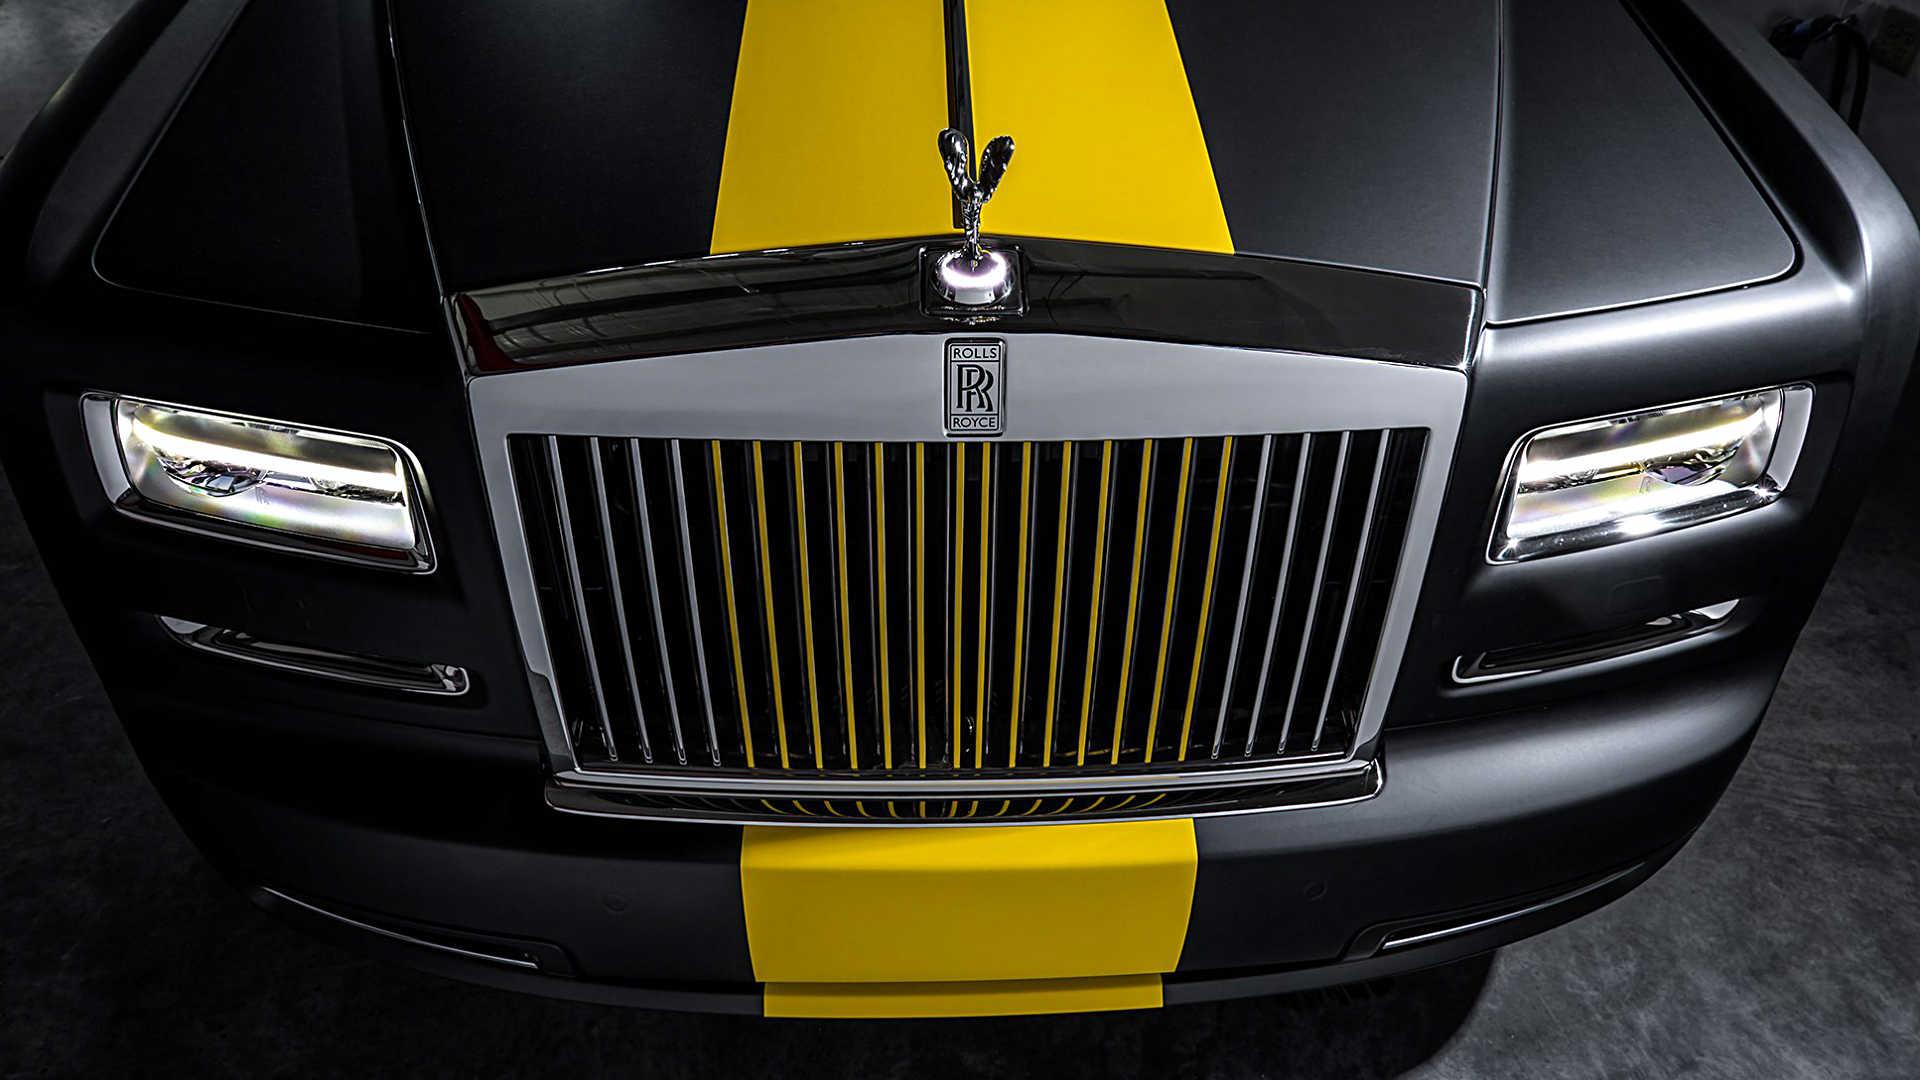 Antonio-Brown-Rolls-Royce-072515-FTR